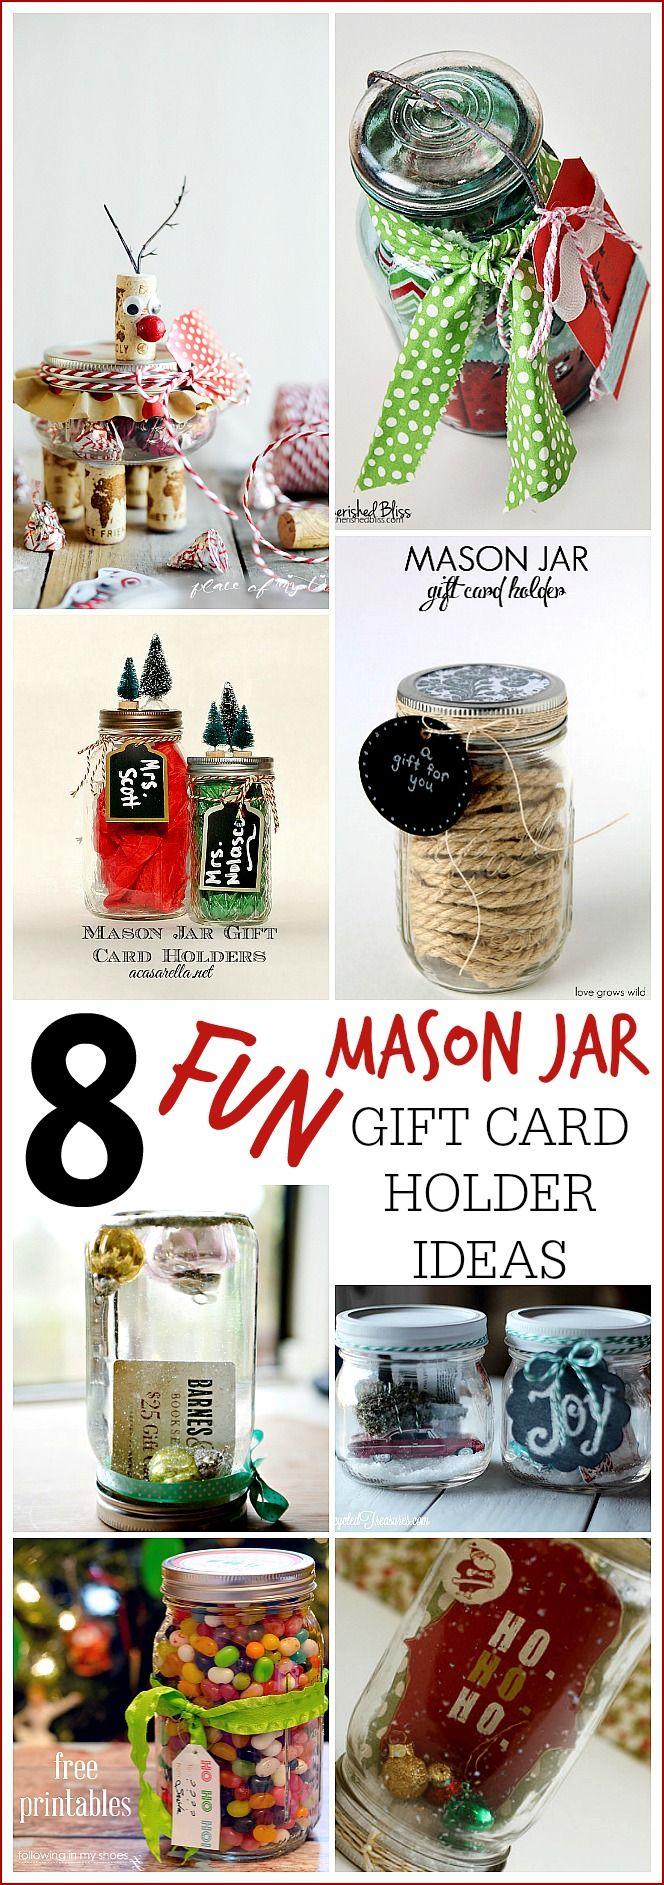 8 FUN MASON JAR GIFT CARD HOLDER IDEAS- Placeofmytaste.com